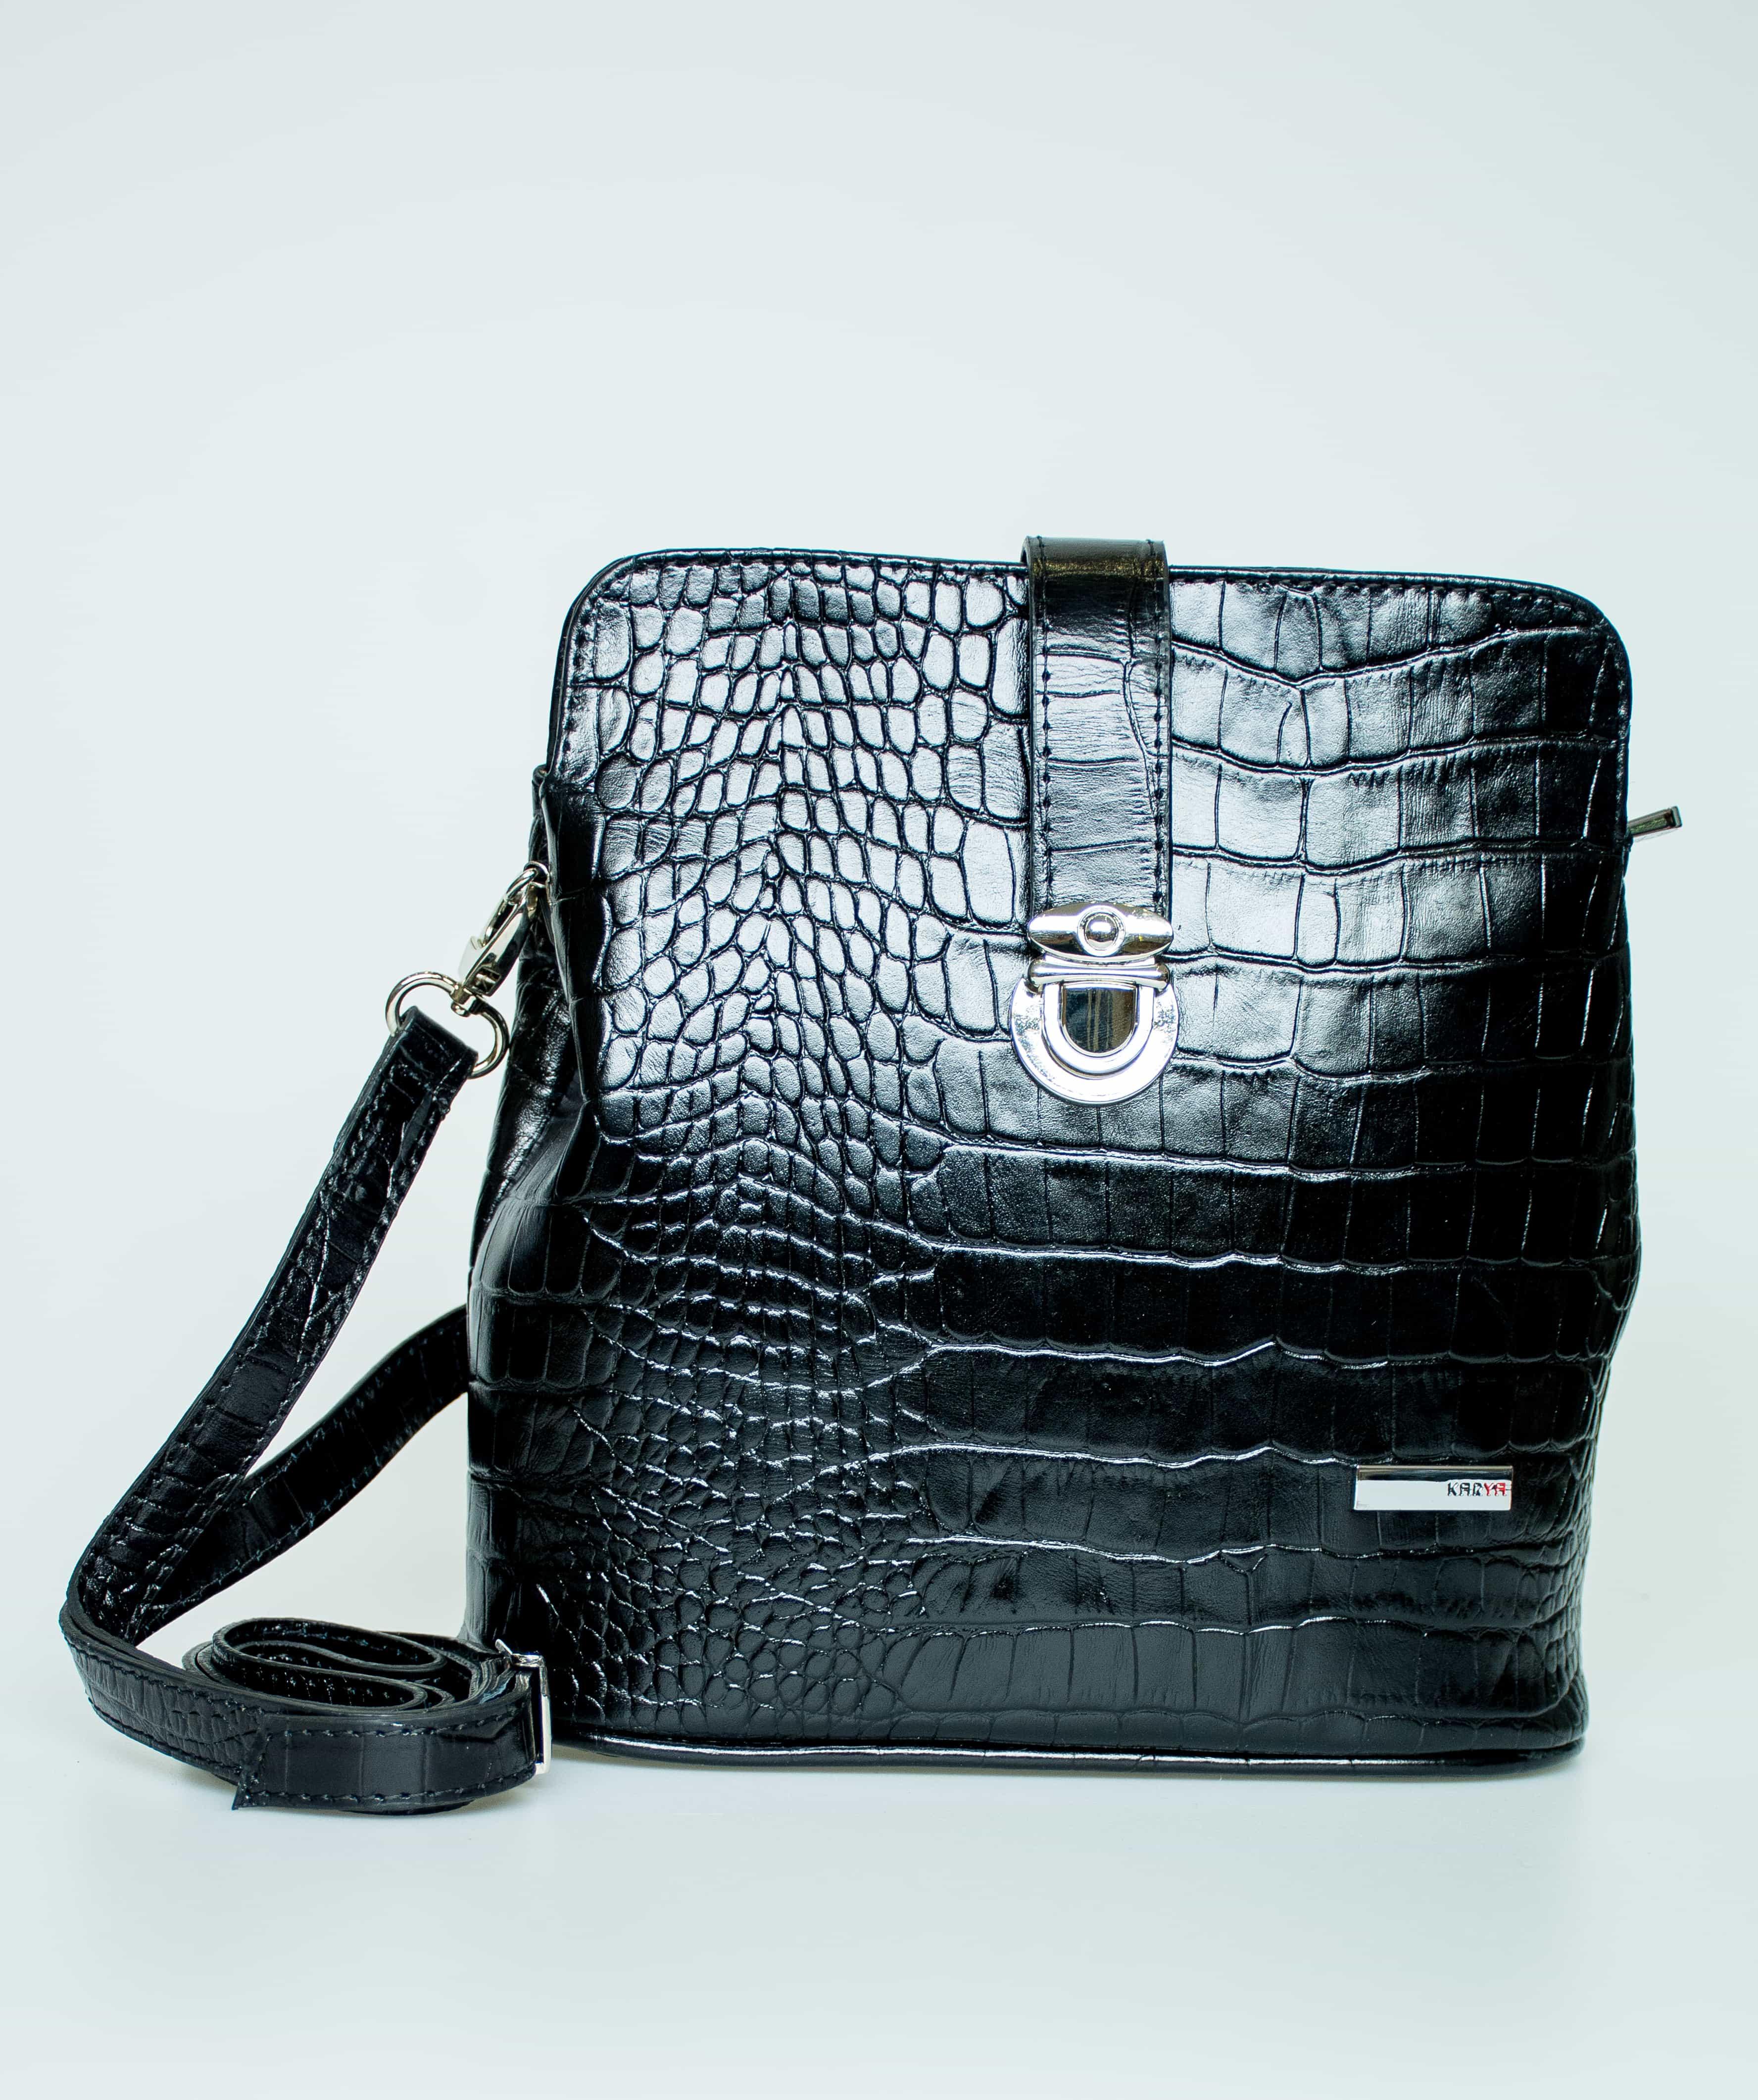 Женская кожаная сумка KARYA. 0380-53